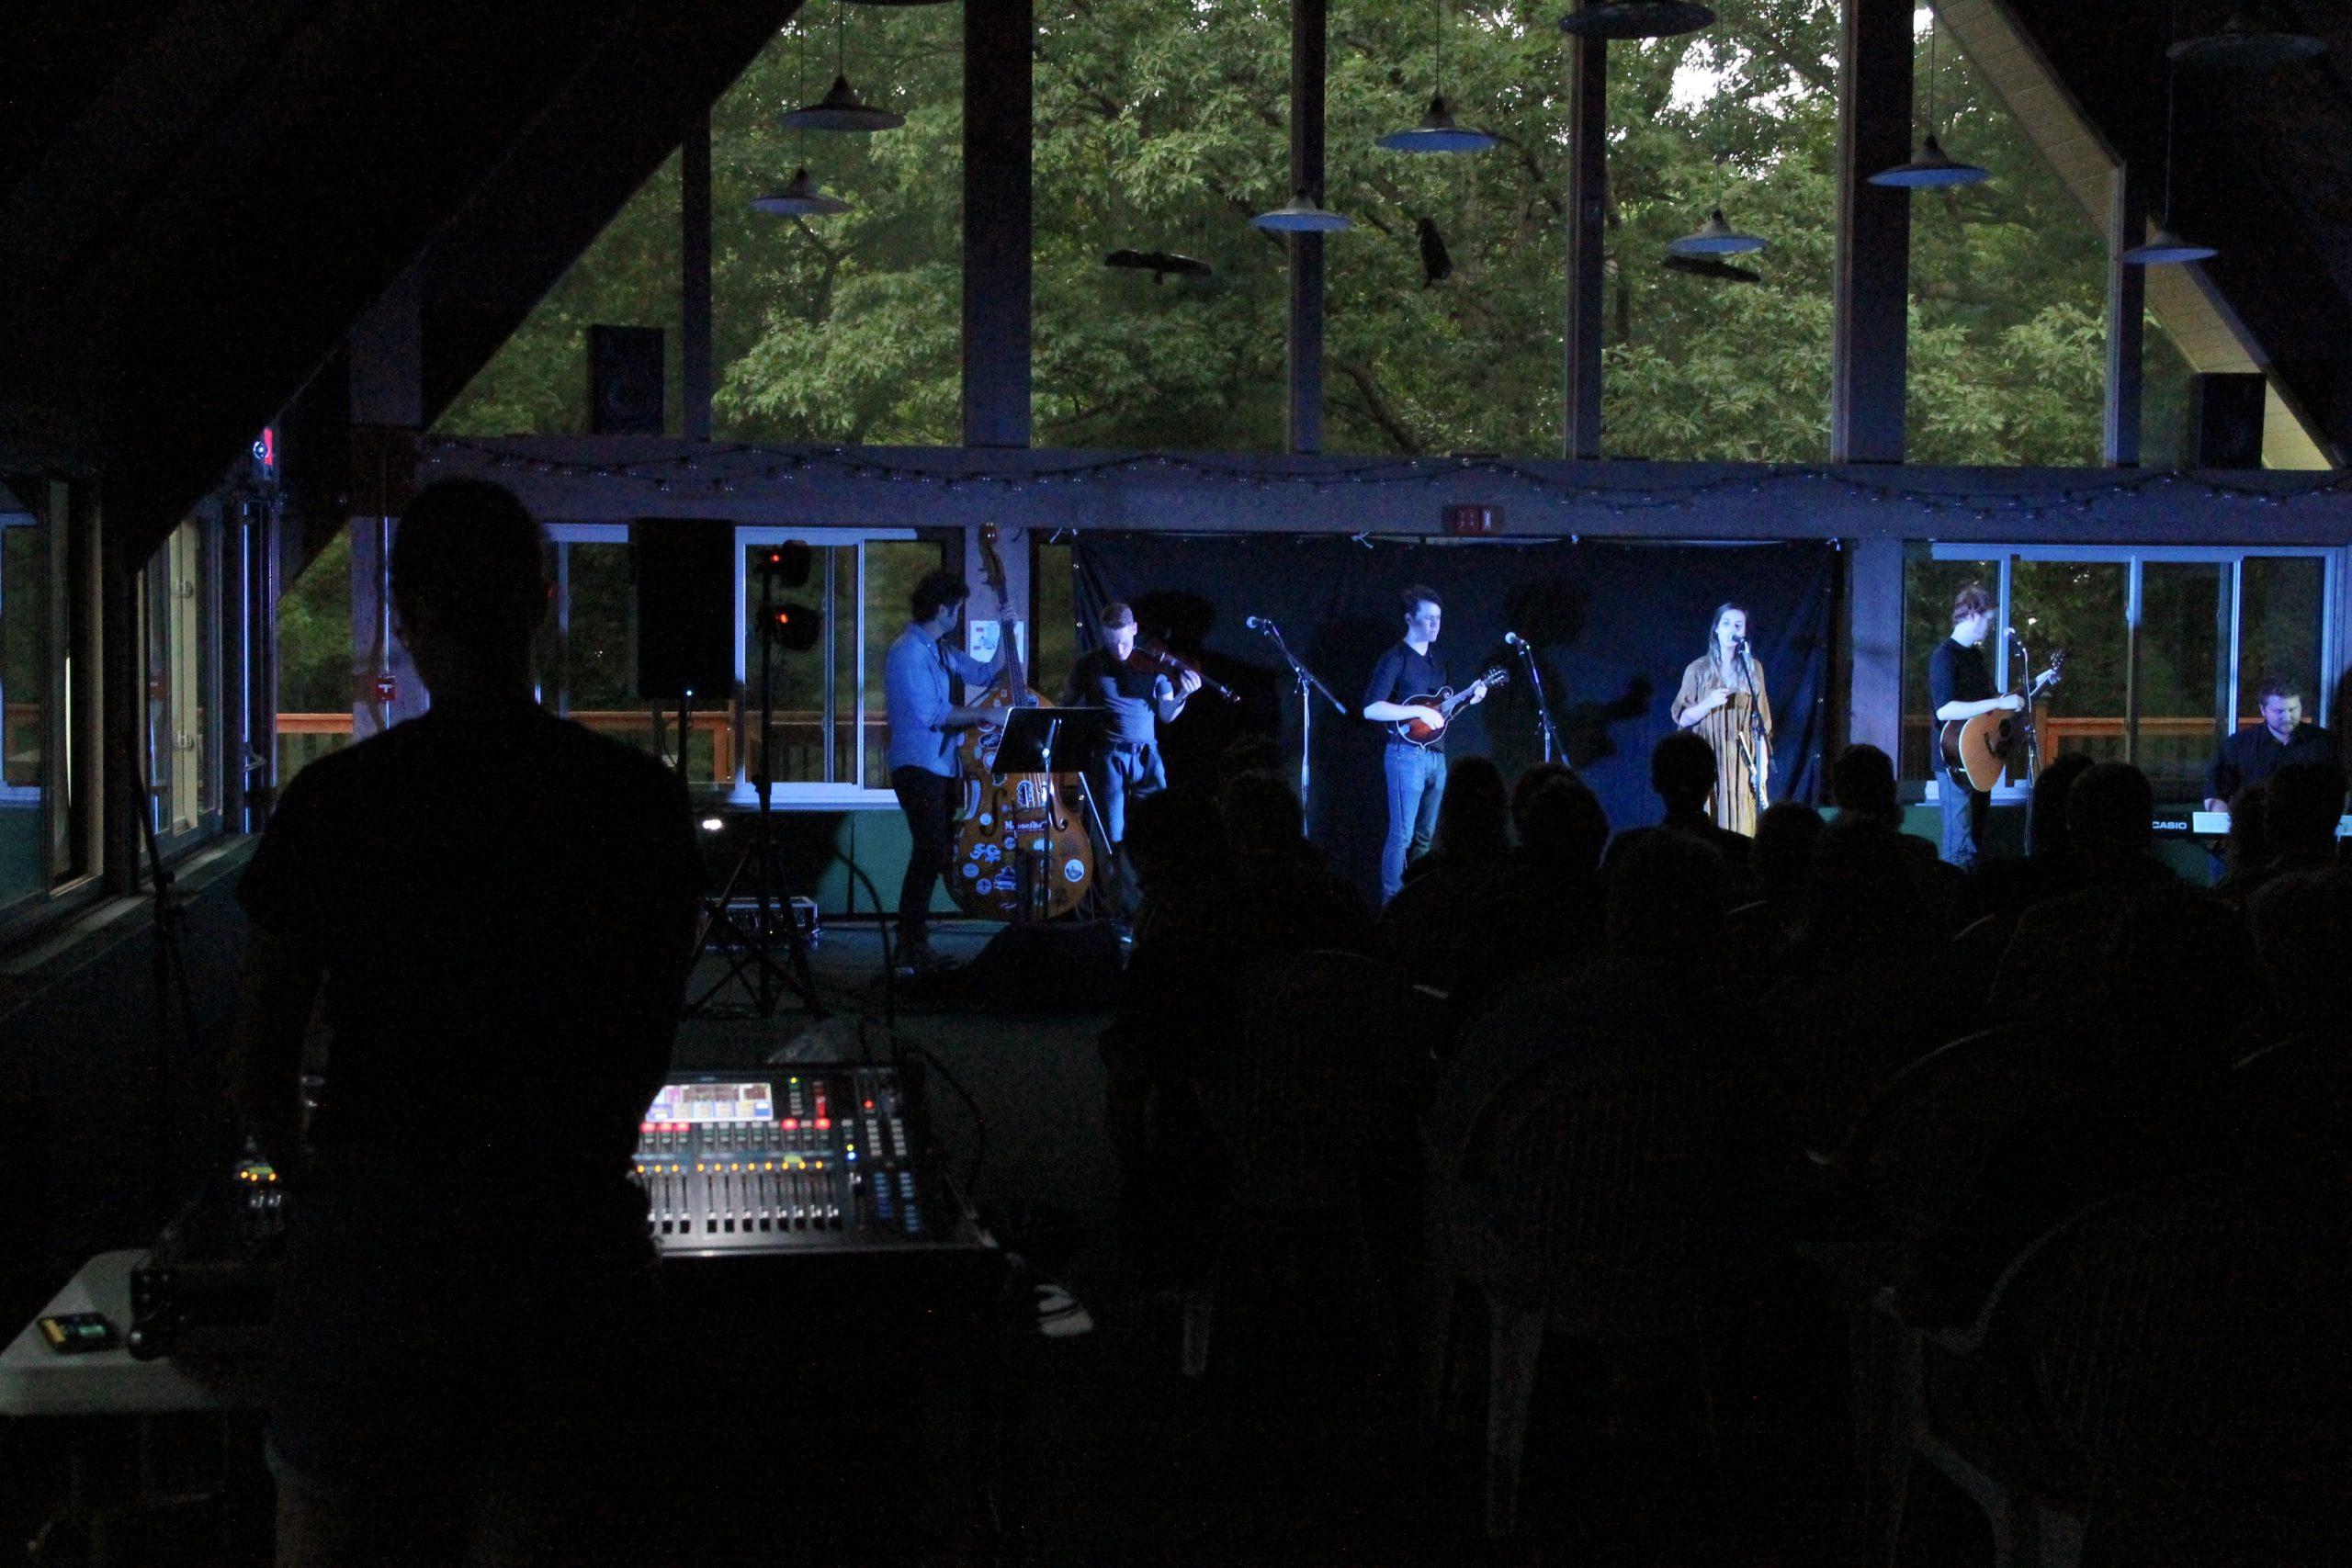 live music concert at The Leelanau School